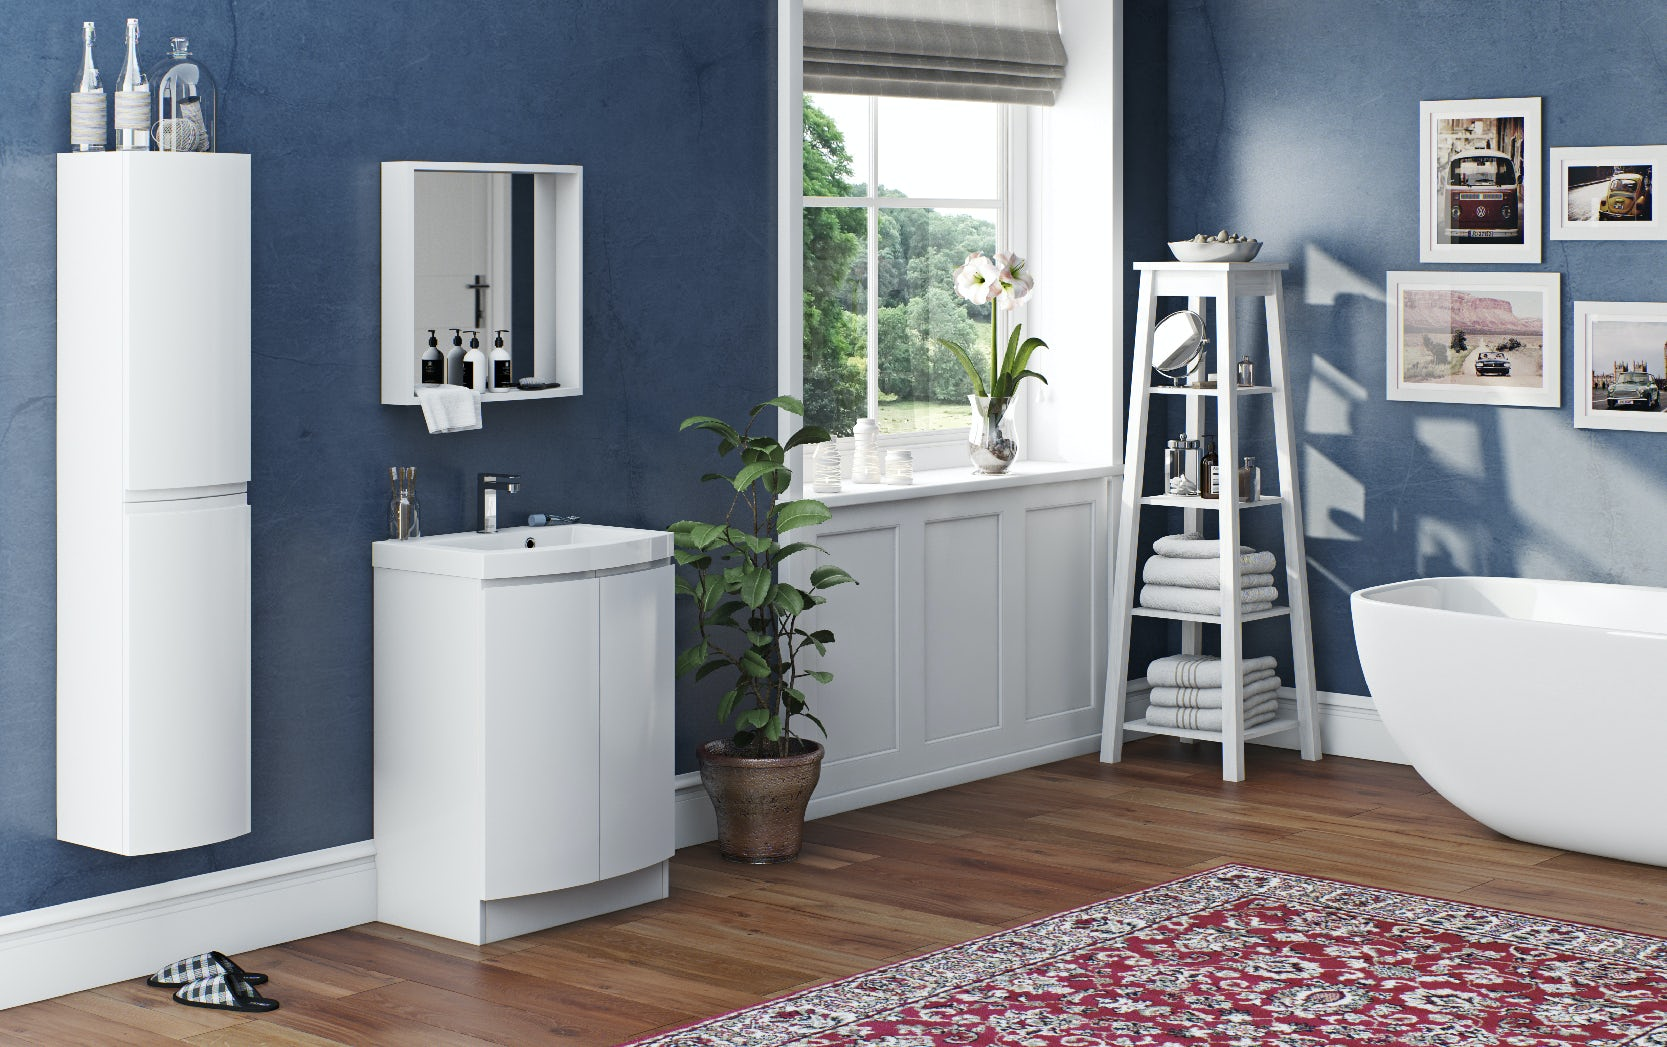 Craig & Rose 1829 bathroom paint